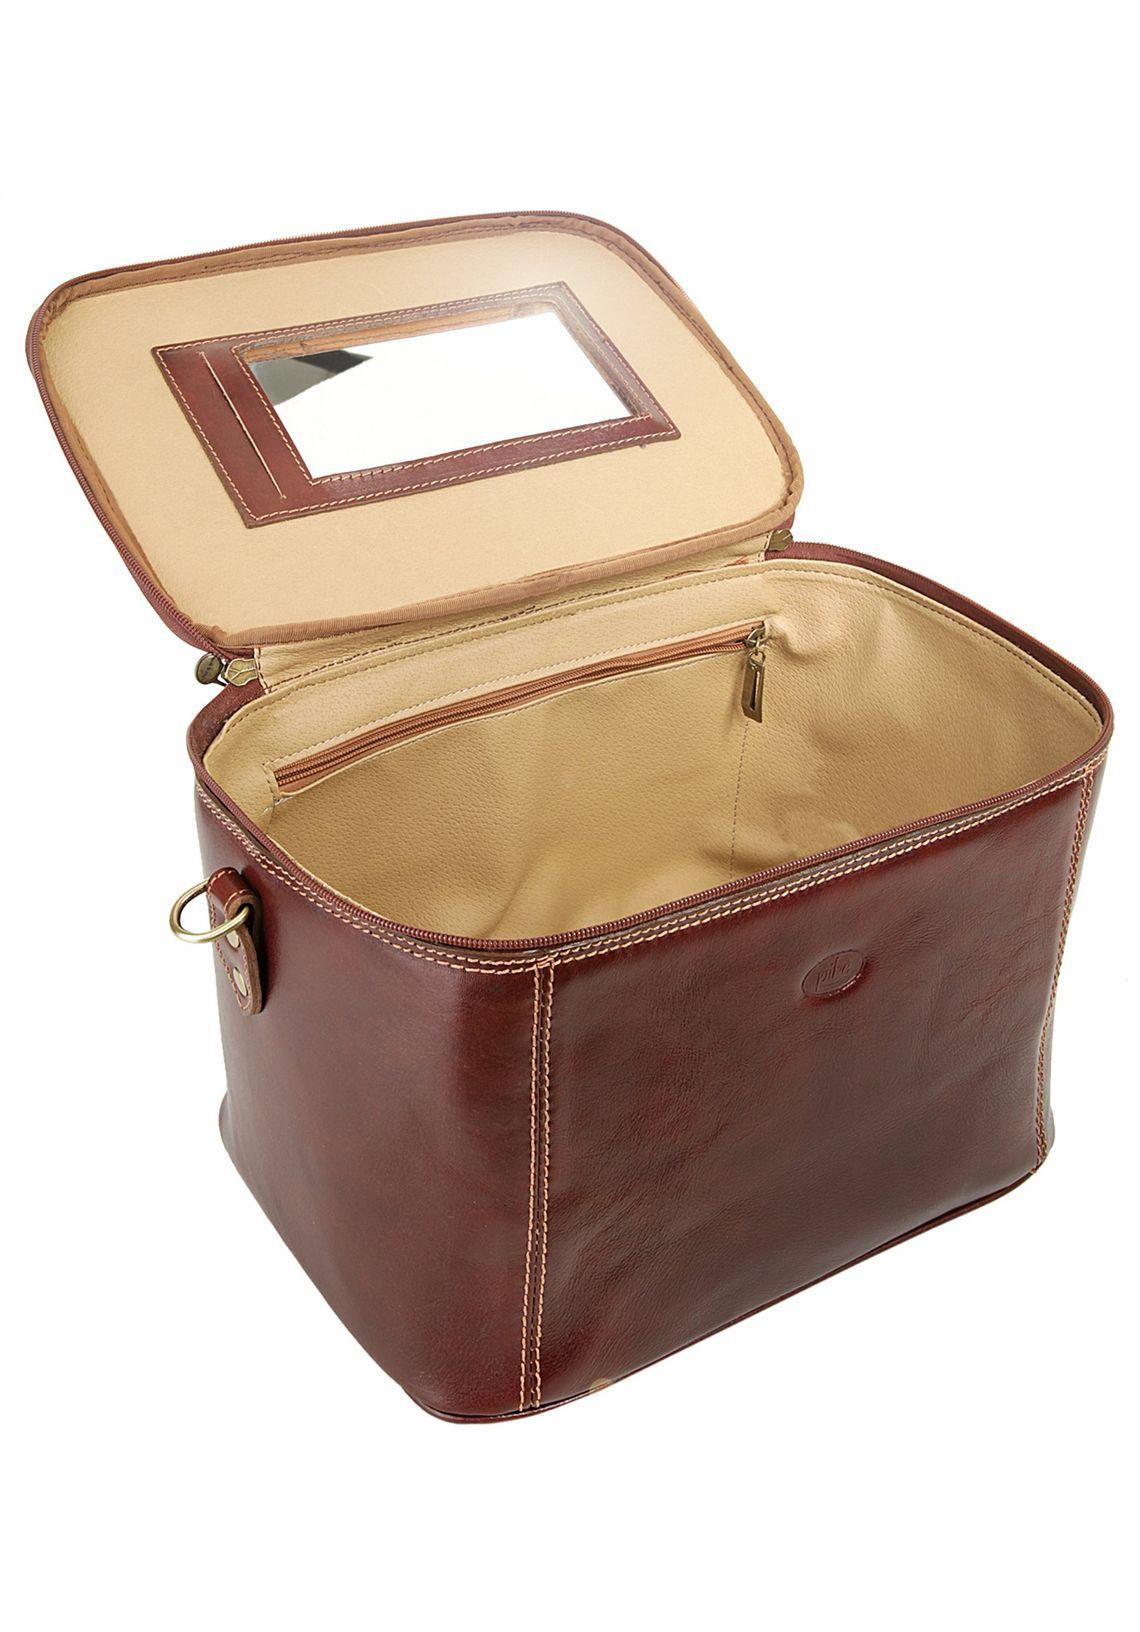 piké Beauty-Case makkelijk gevonden  bruin